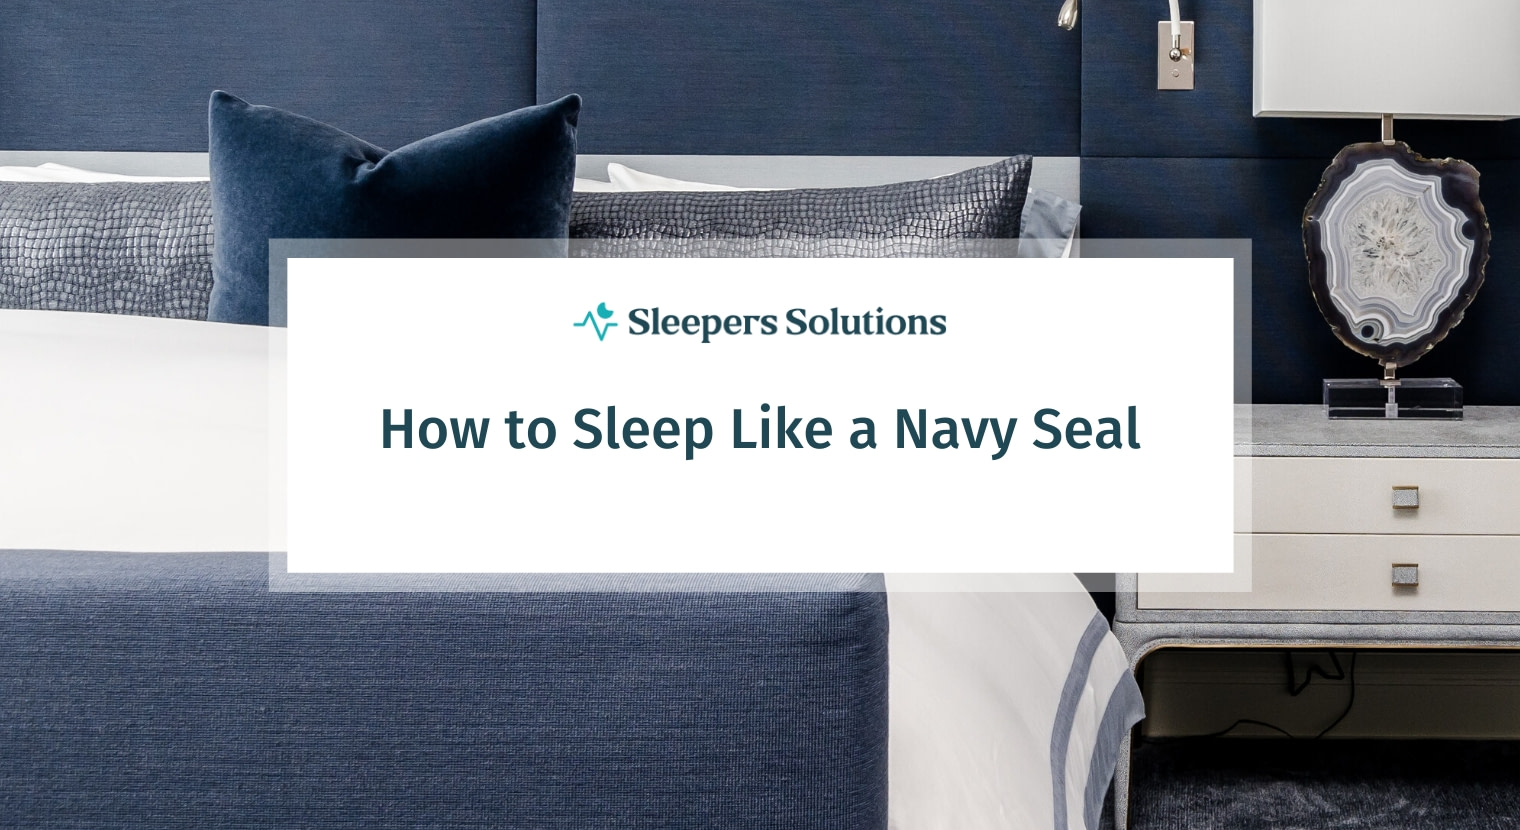 How to Sleep Like a Navy Seal